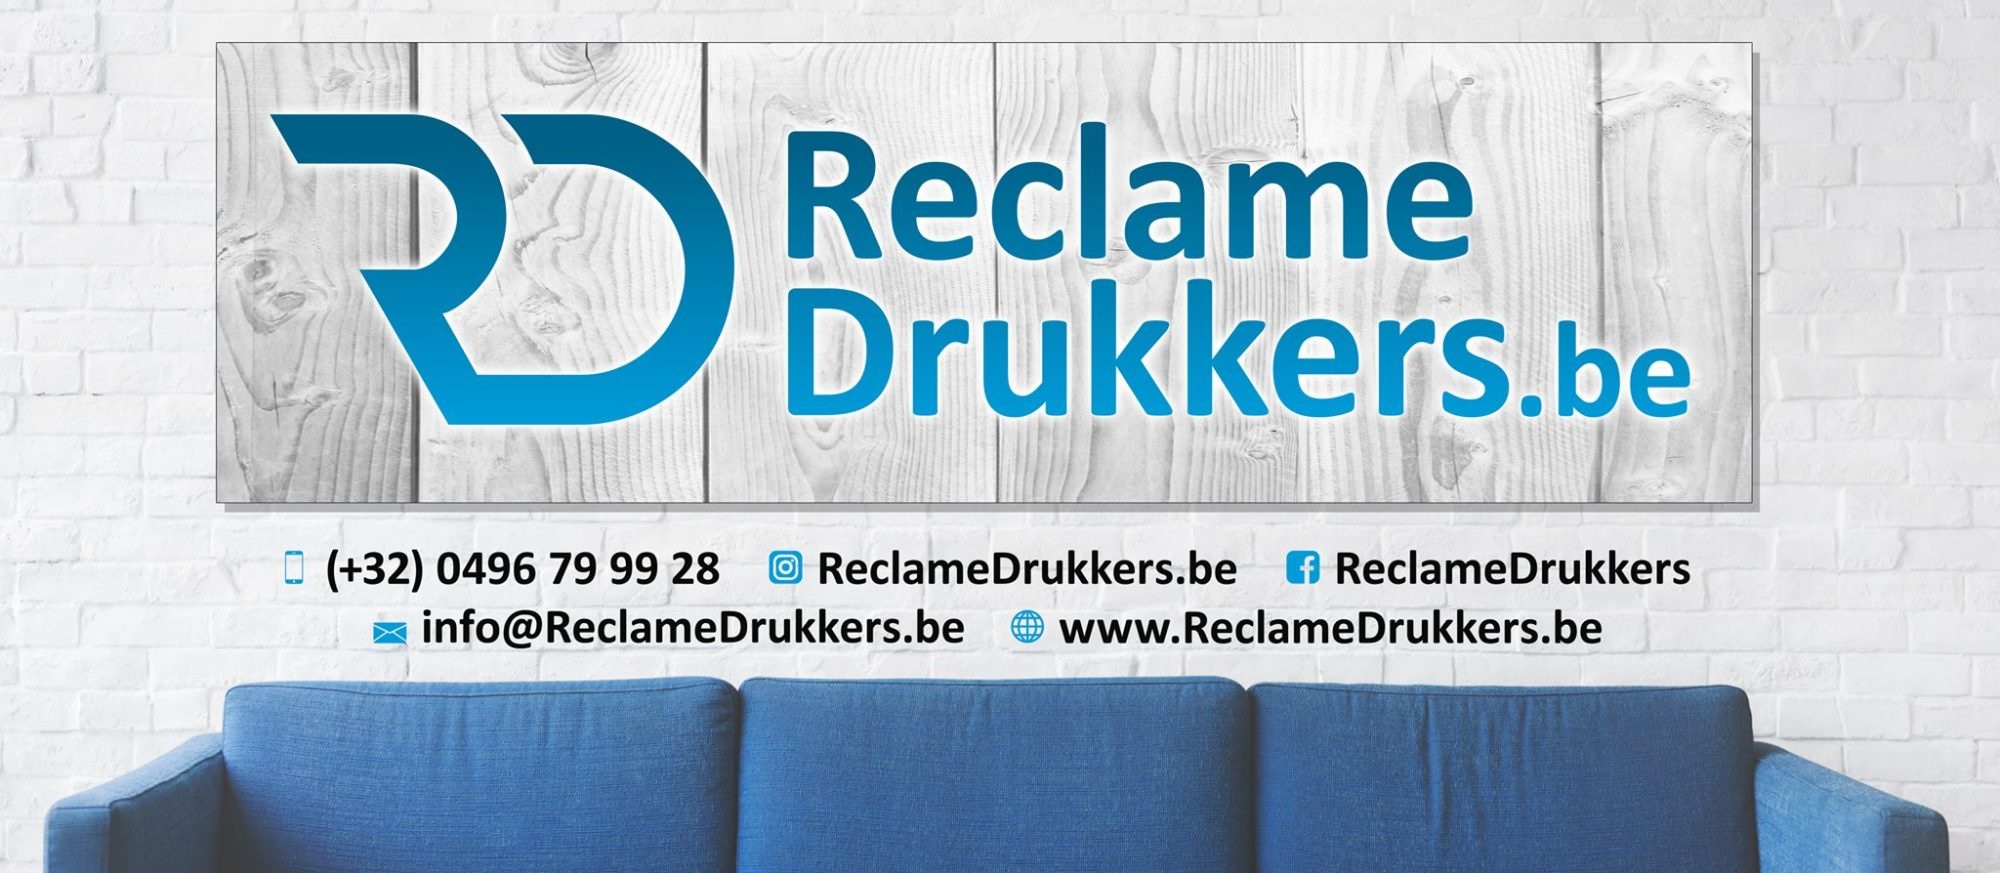 ReclameDrukkers.be